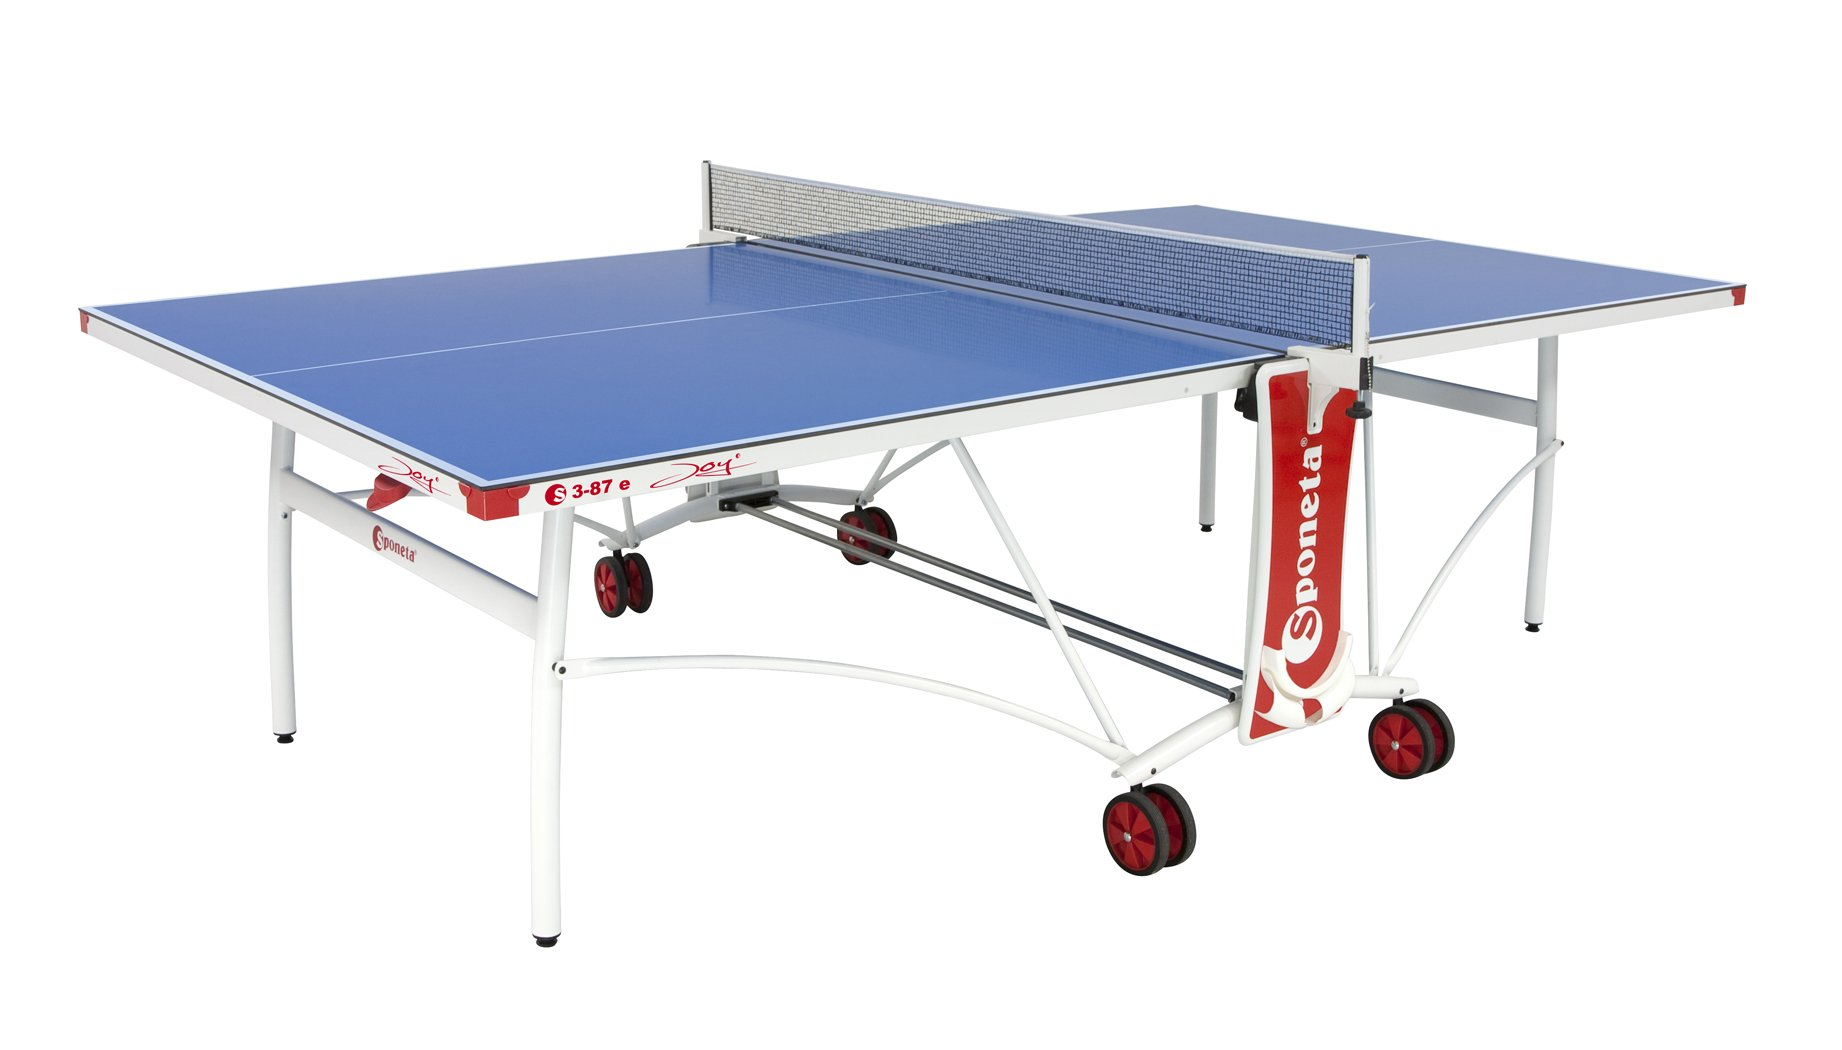 Sponeta Joy Indoor/Outdoor Table Tennis Table, Blue Top by Sponeta